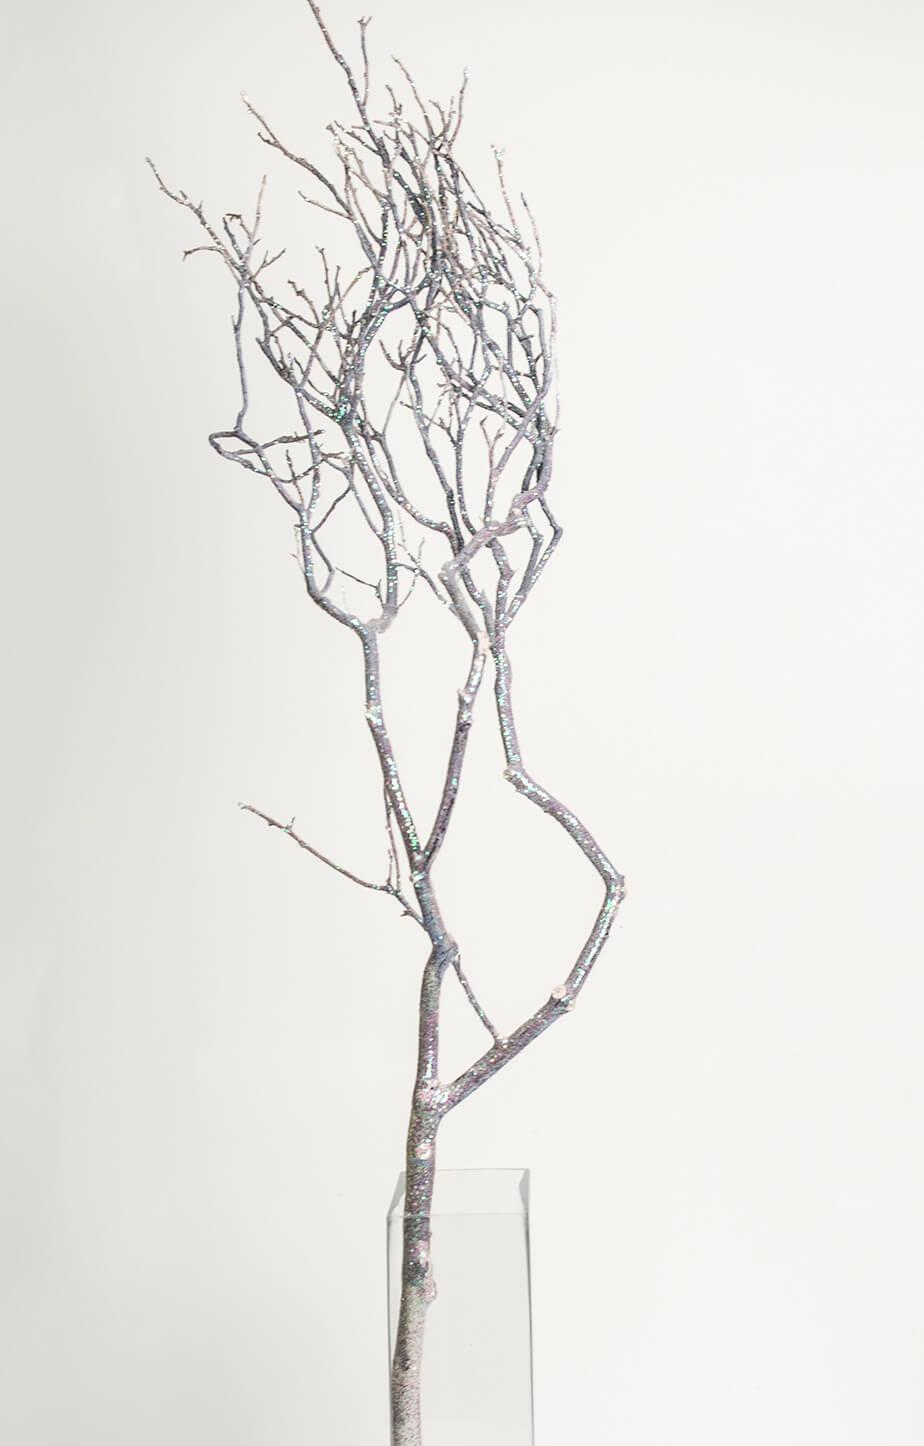 Extra Tall Iridescent Glitter Natural Manzanita Branches 36-52in